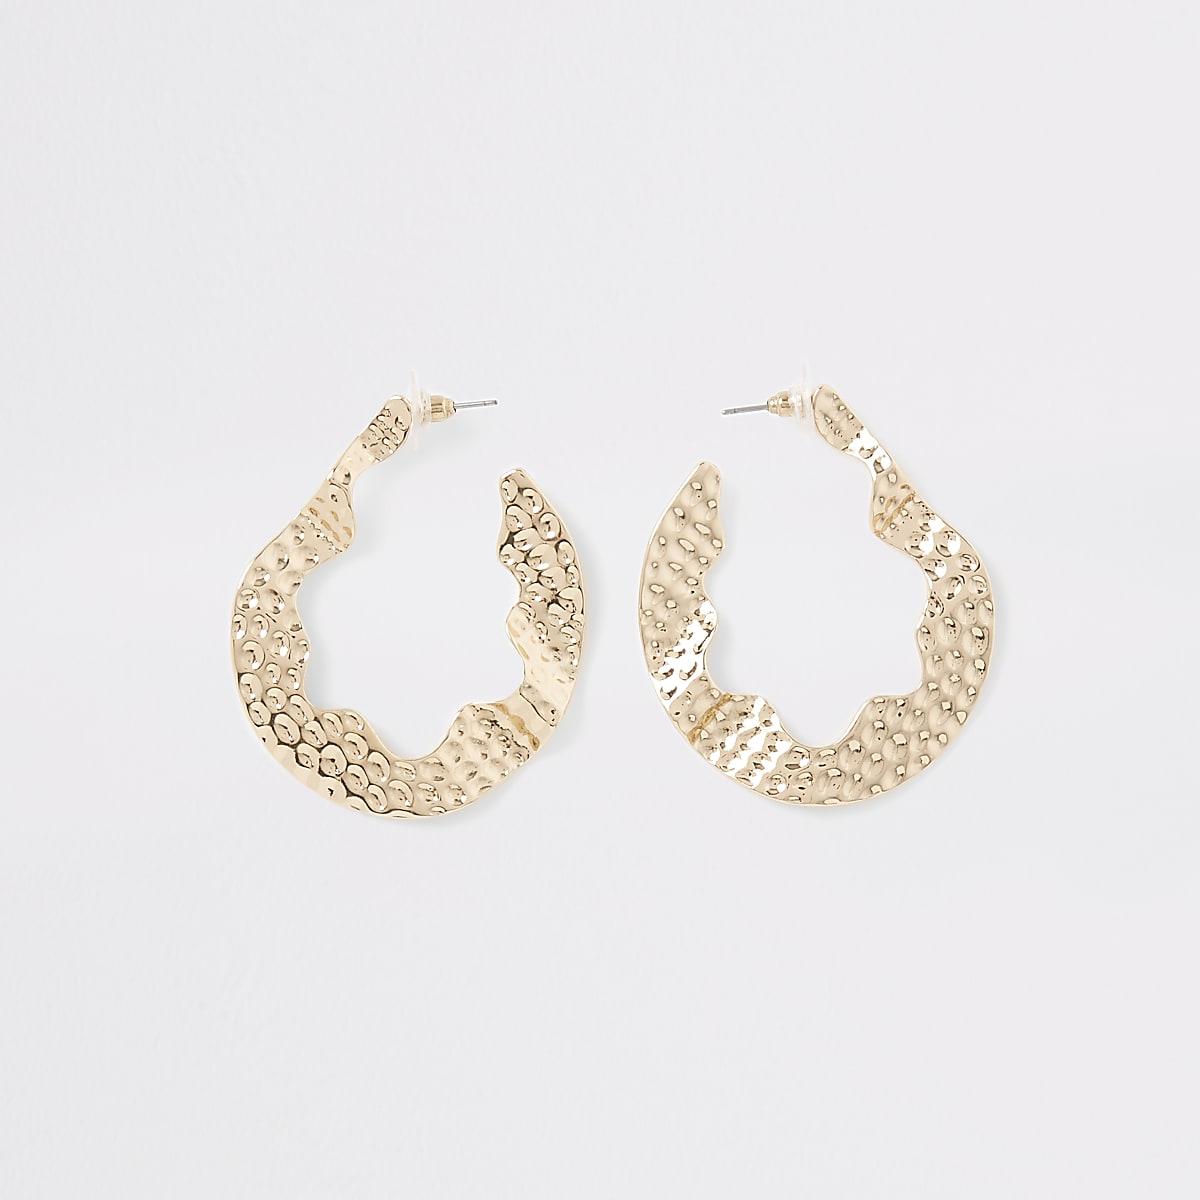 Gold color battered hoop earrings